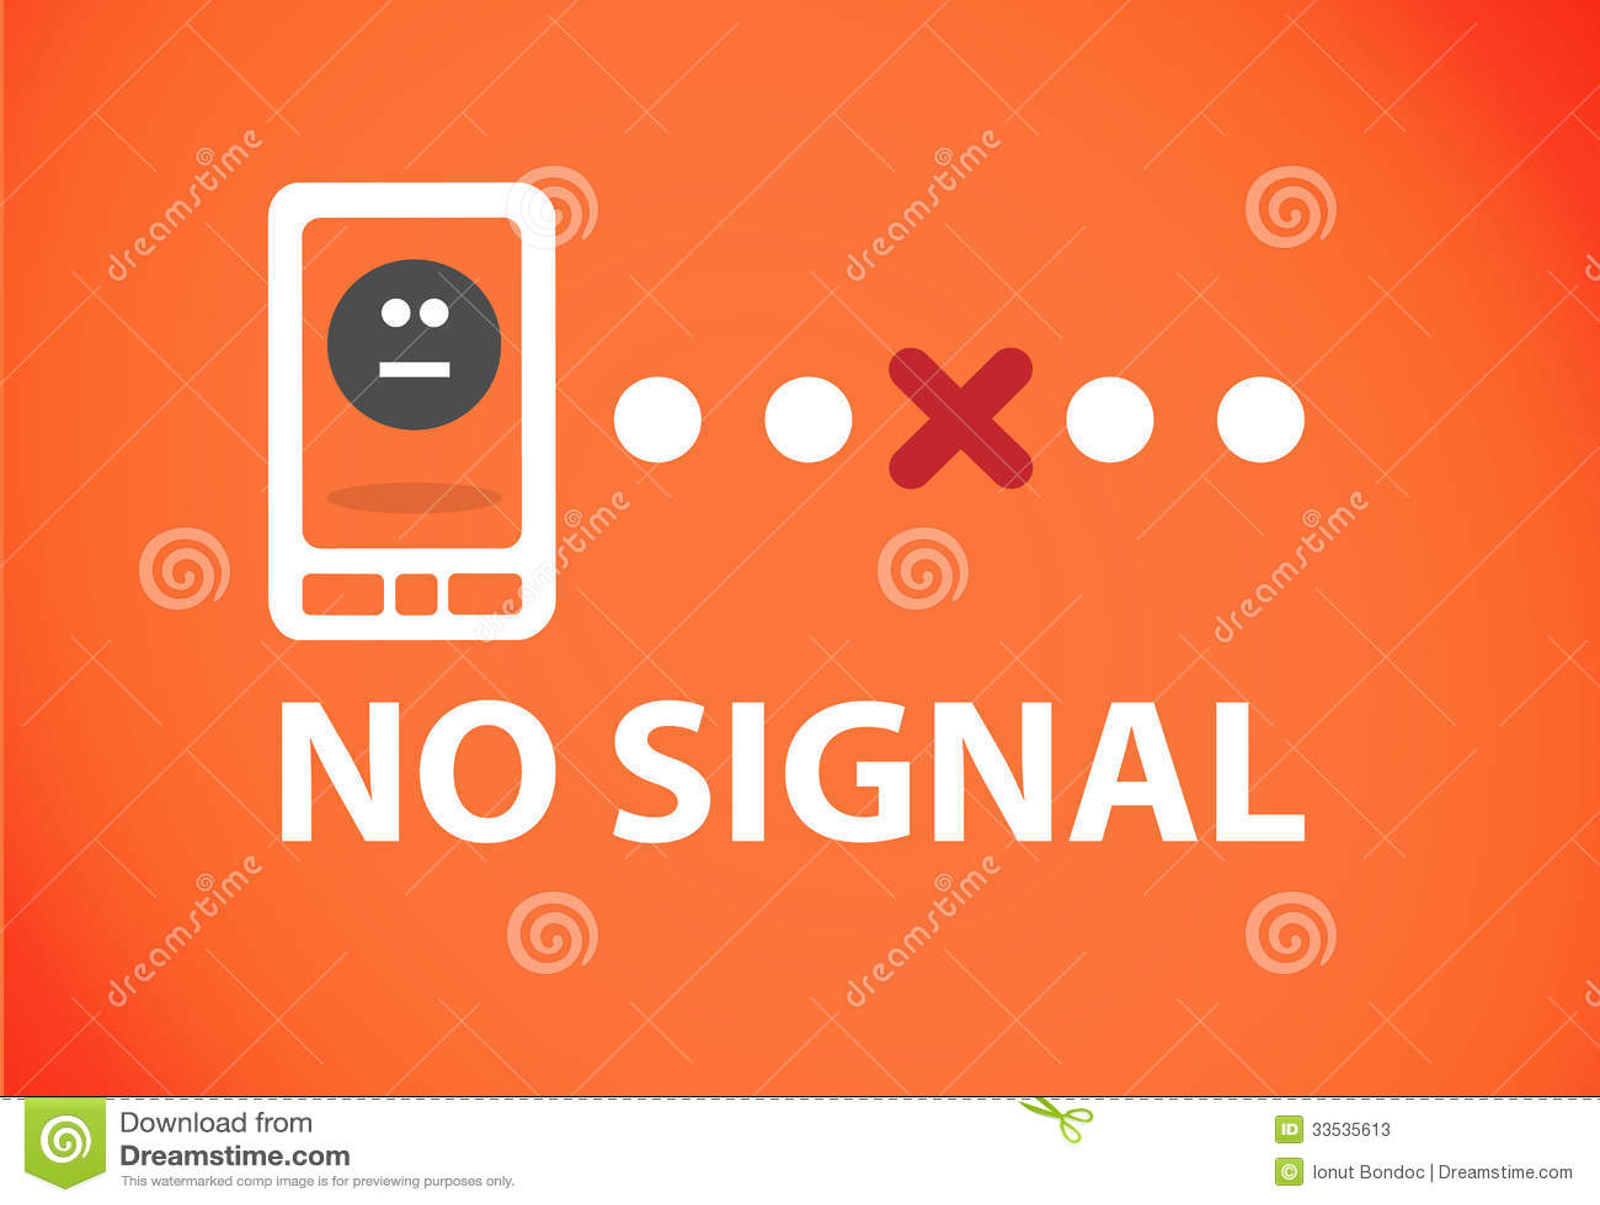 Phone no signal stock illustration  Illustration of business - 33535613